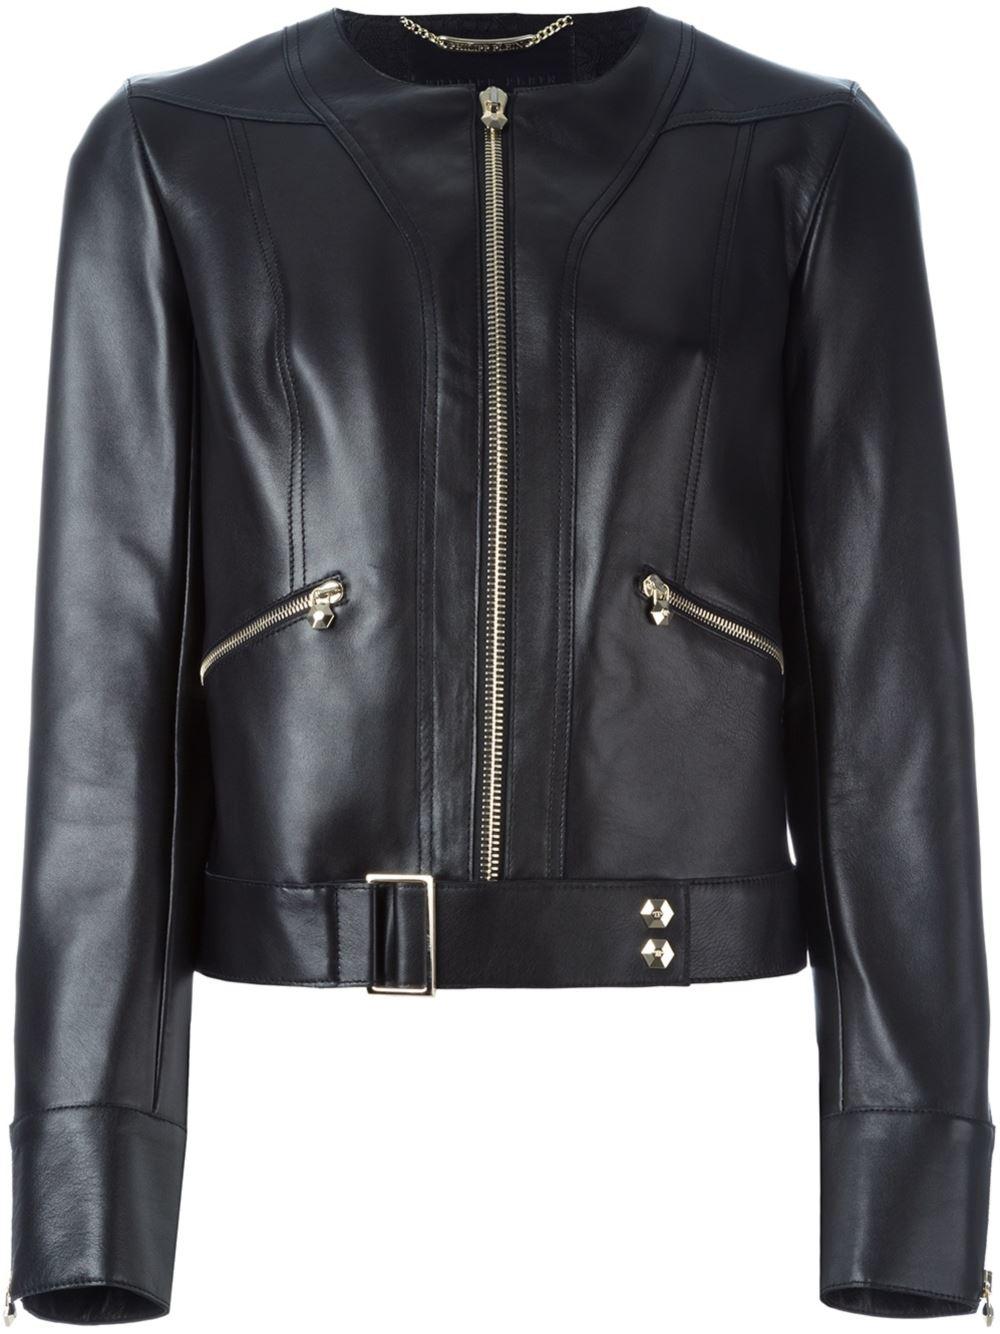 philipp plein 39 patience 39 jacket in multicolor black lyst. Black Bedroom Furniture Sets. Home Design Ideas